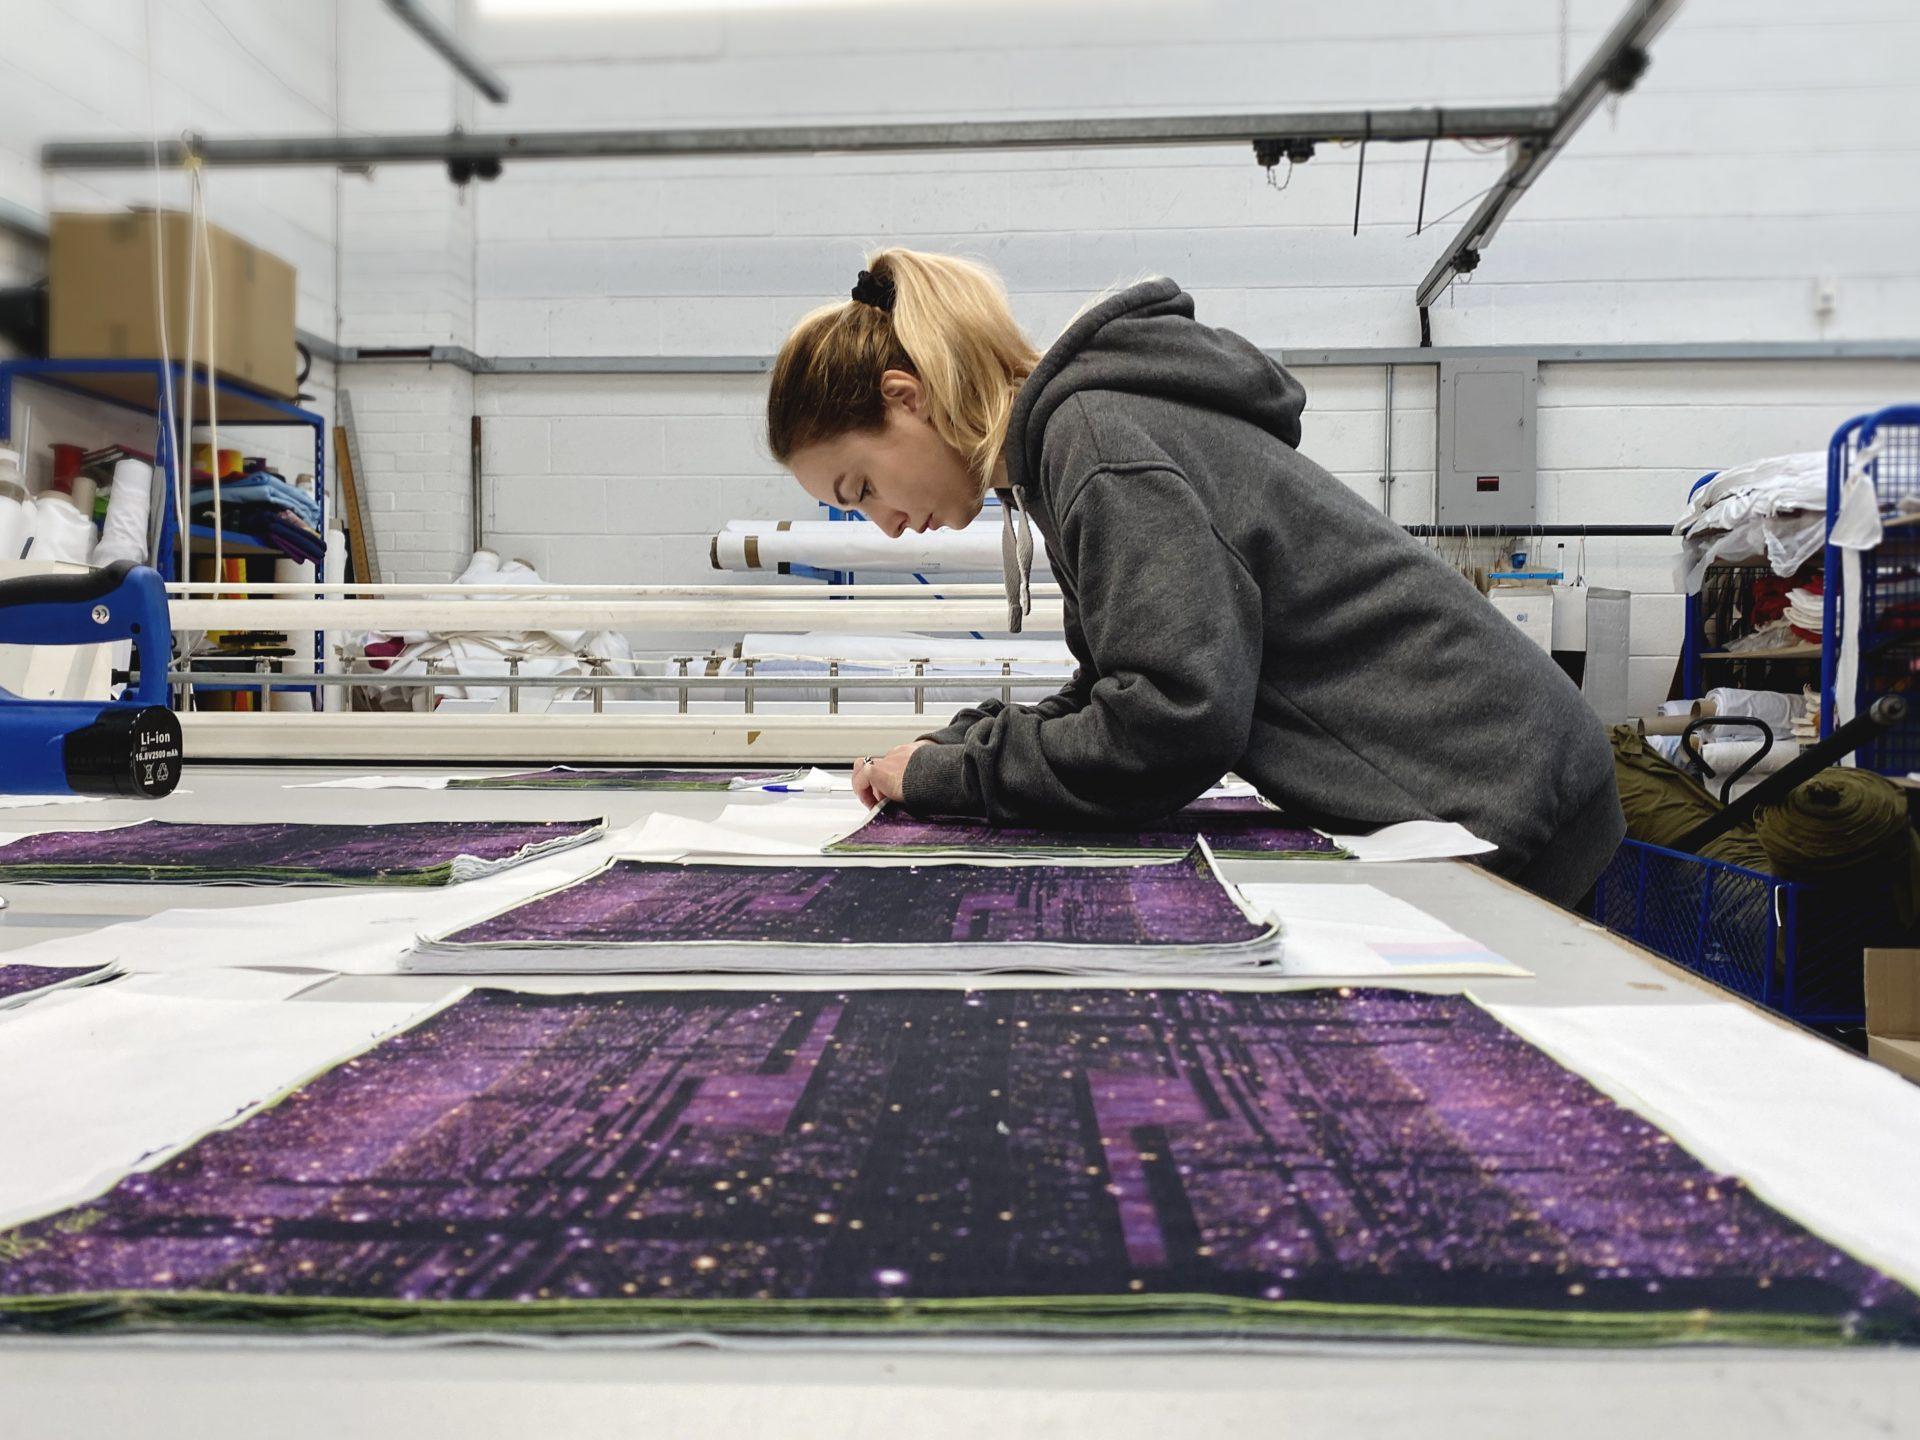 Bespoke made UK textile merchandise